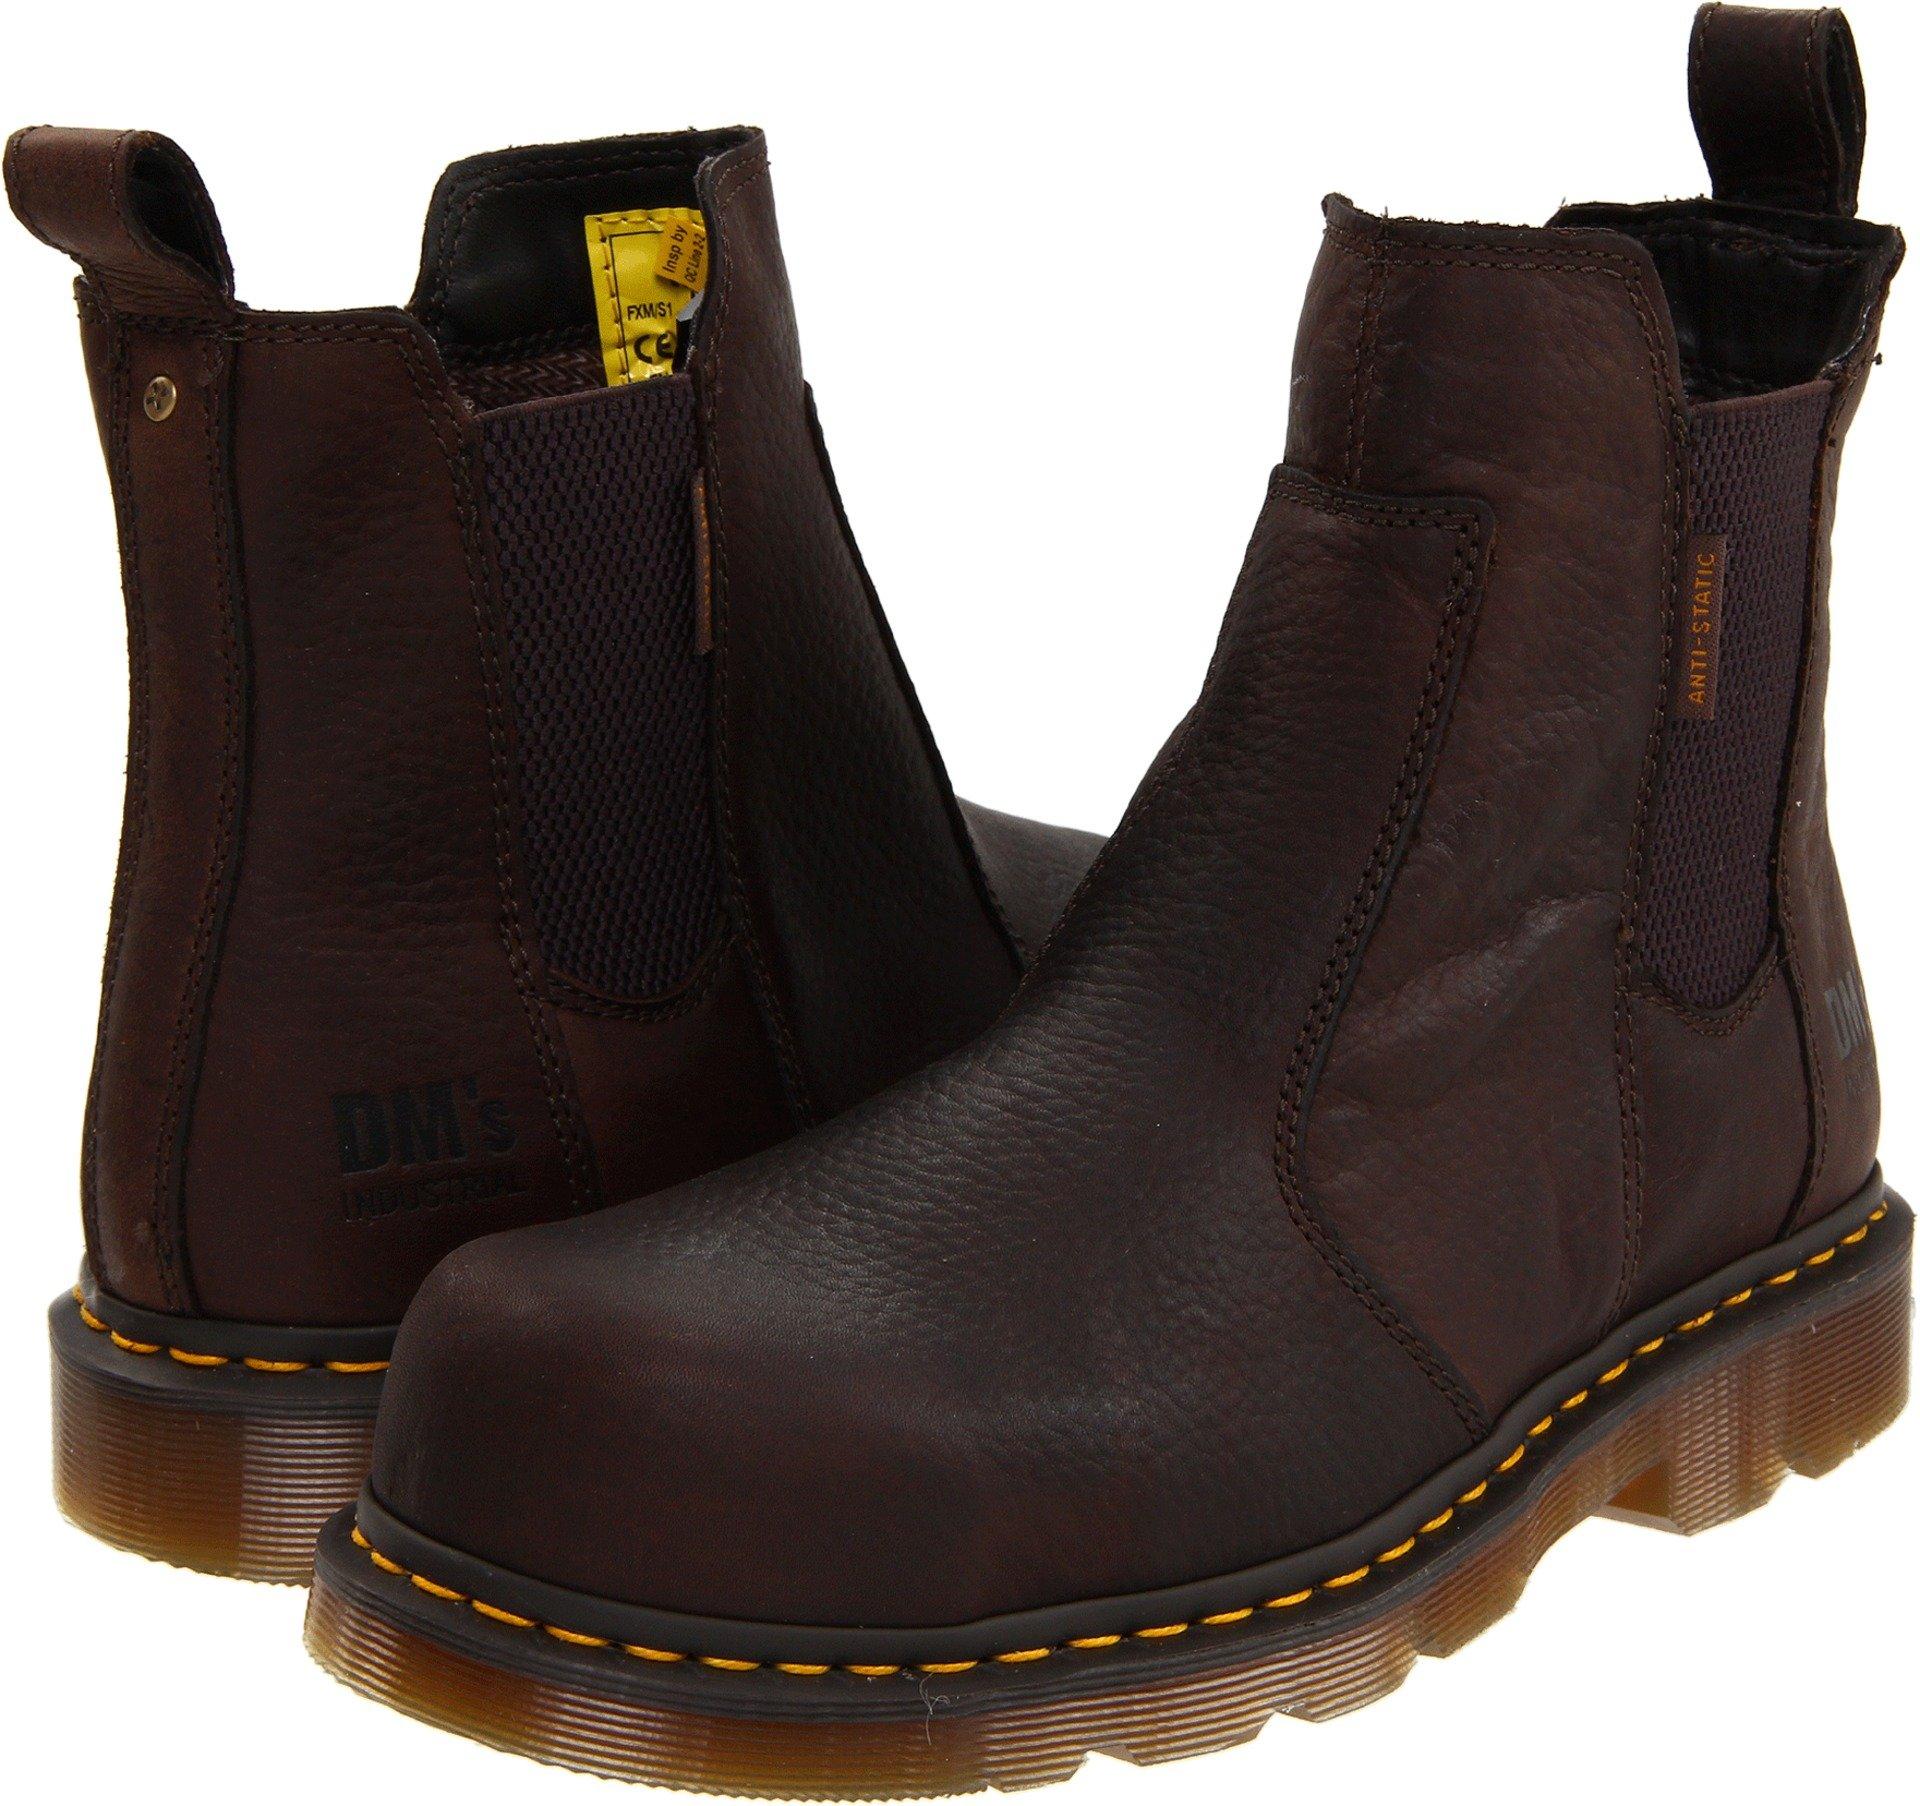 Dr. Martens Men's Fusion Safety Toe Chelsea Boot,Bark,11 UK/12 M US